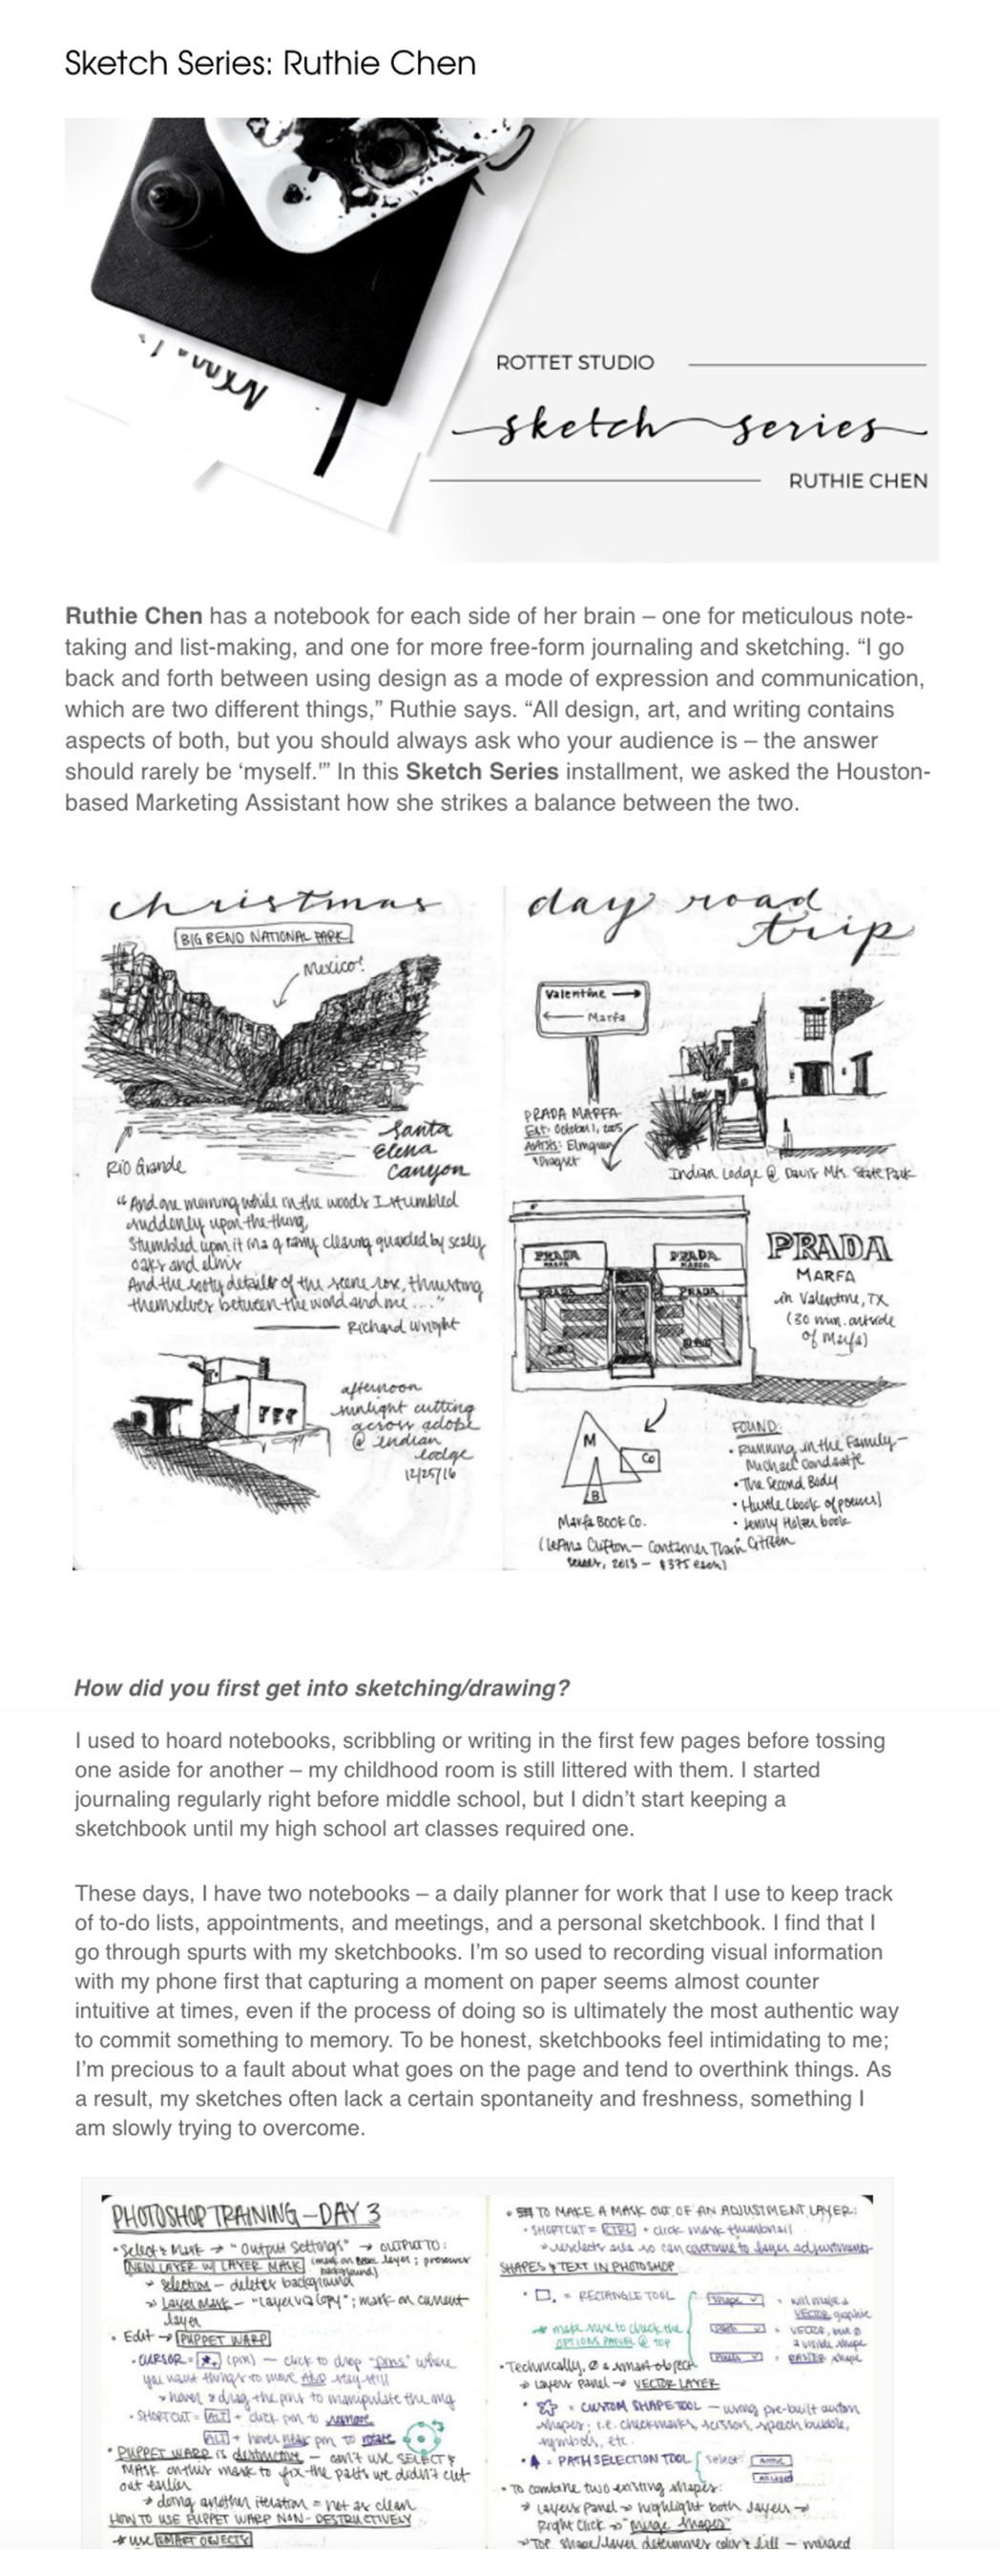 Sketch Series_Rottet Talk.jpg